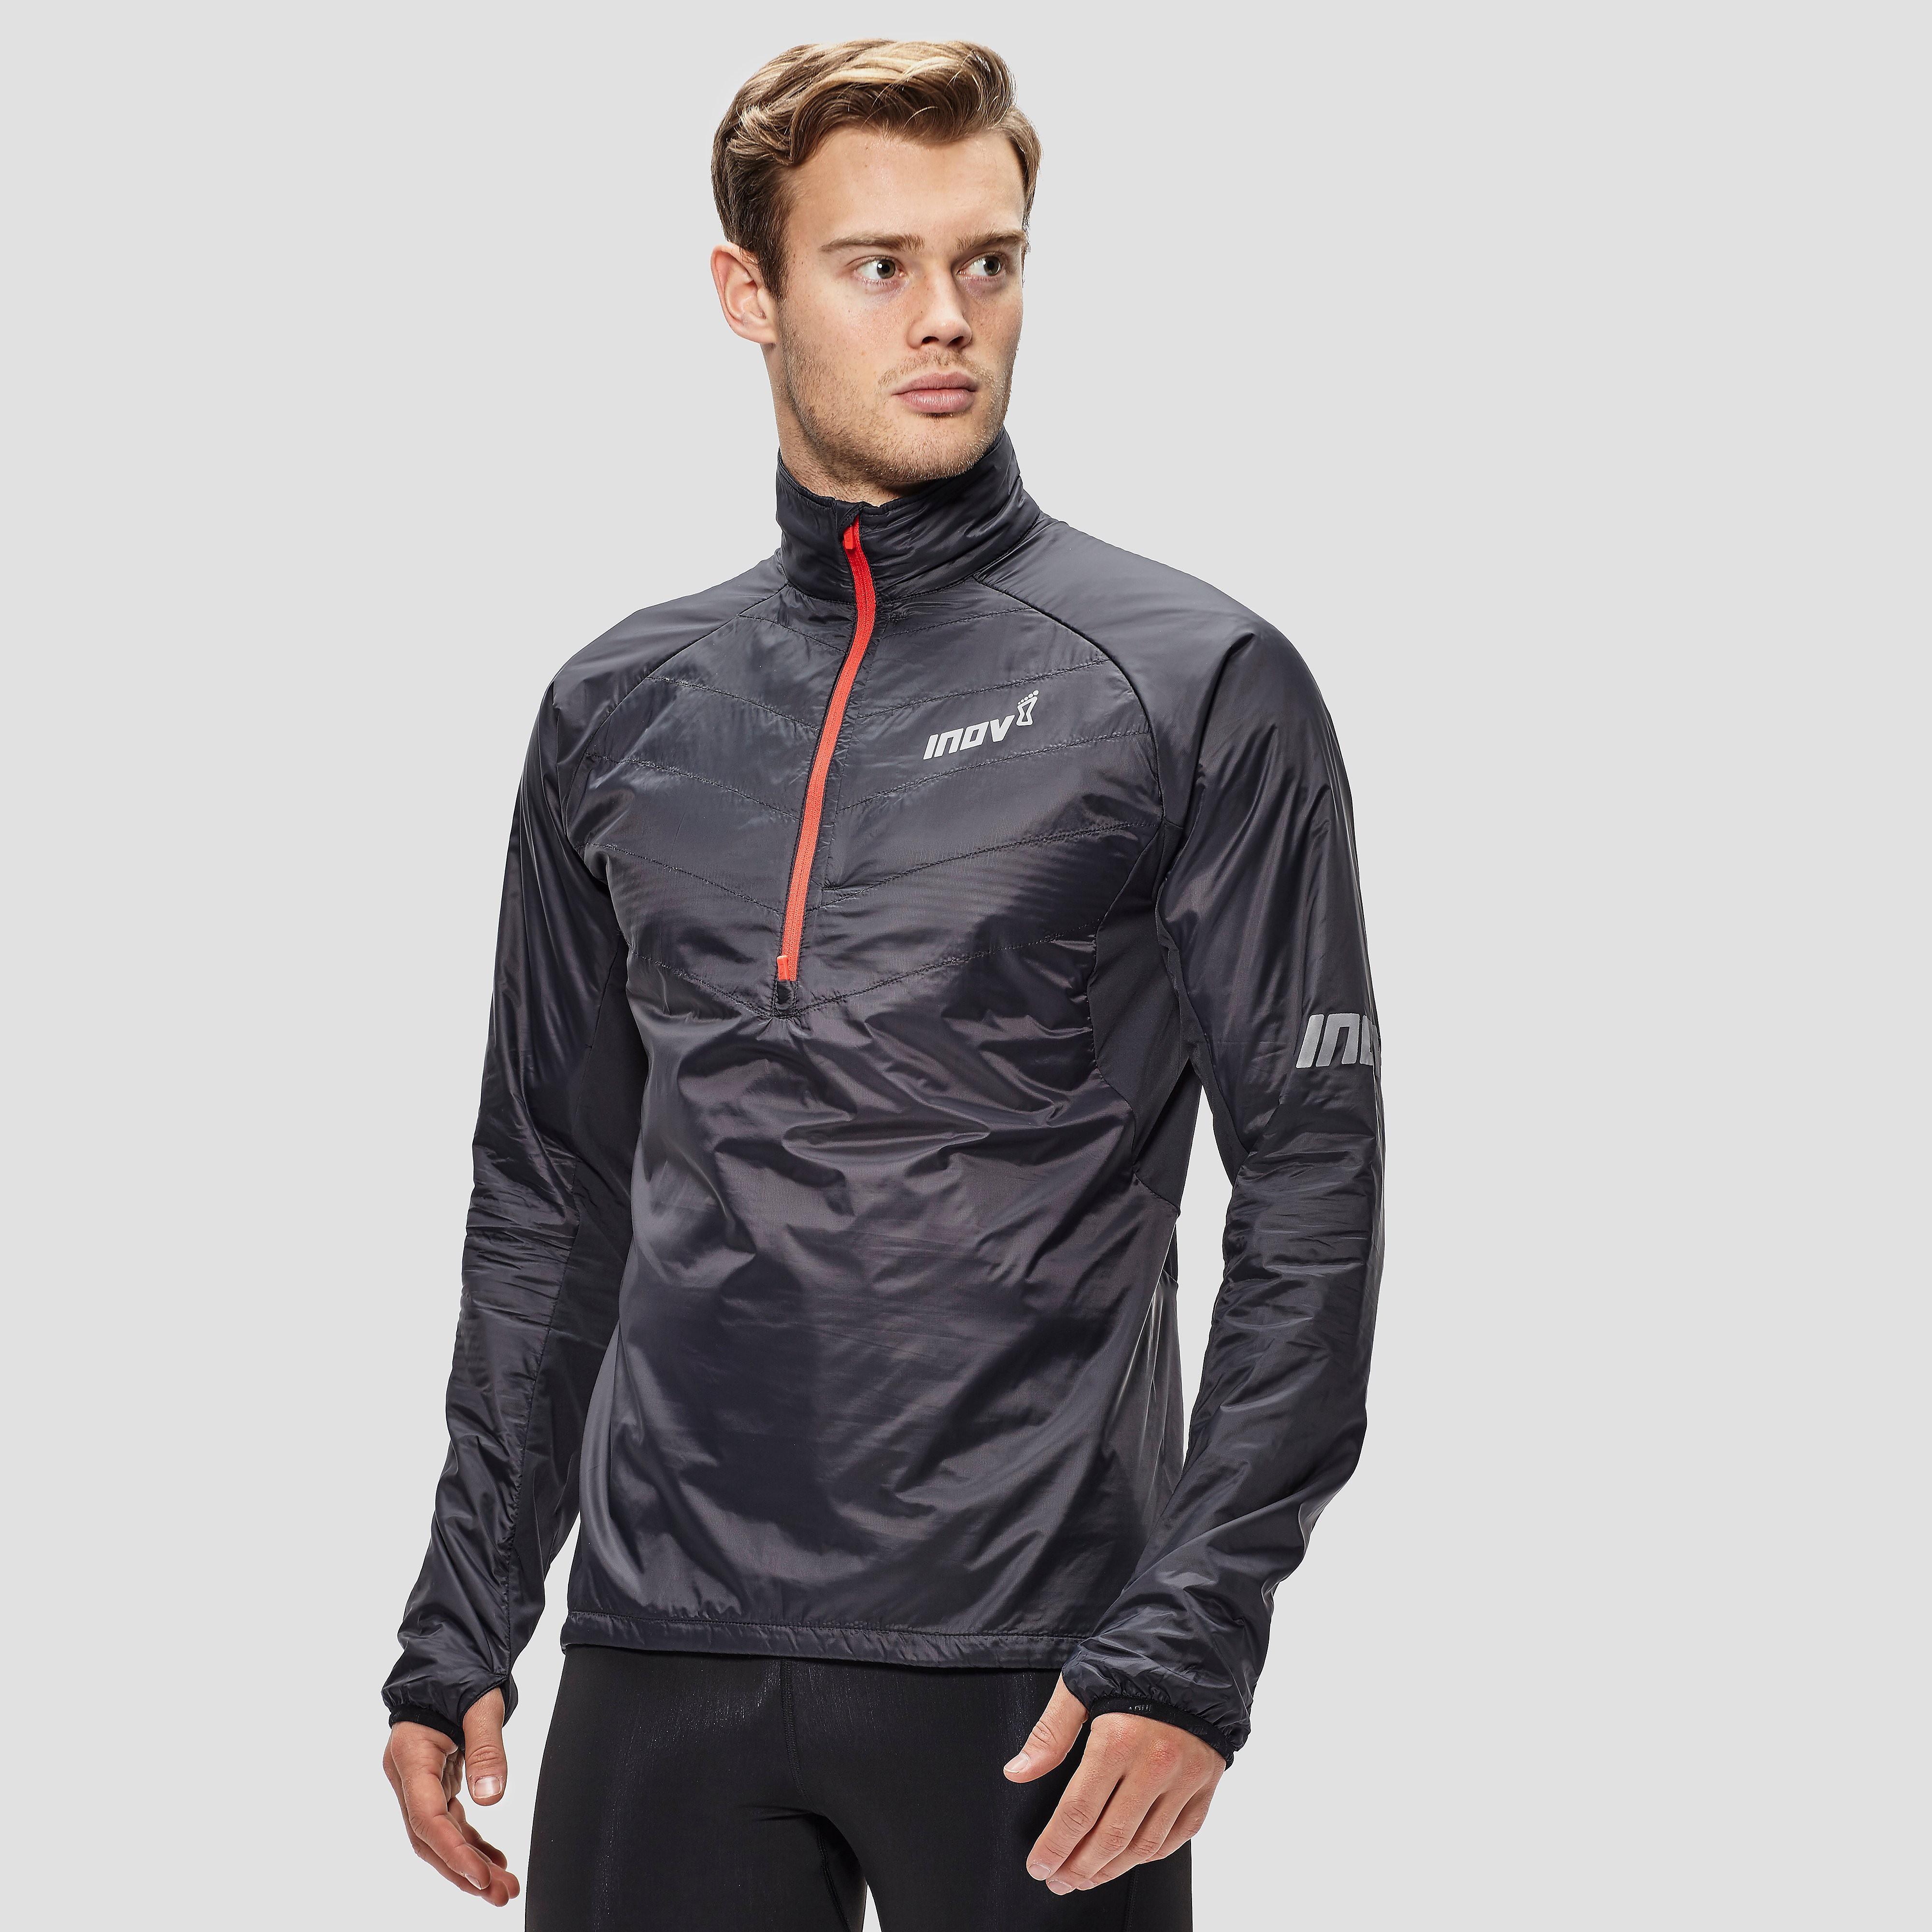 Inov-8 AT/C THERMOSHELL Halfzip men's jacket